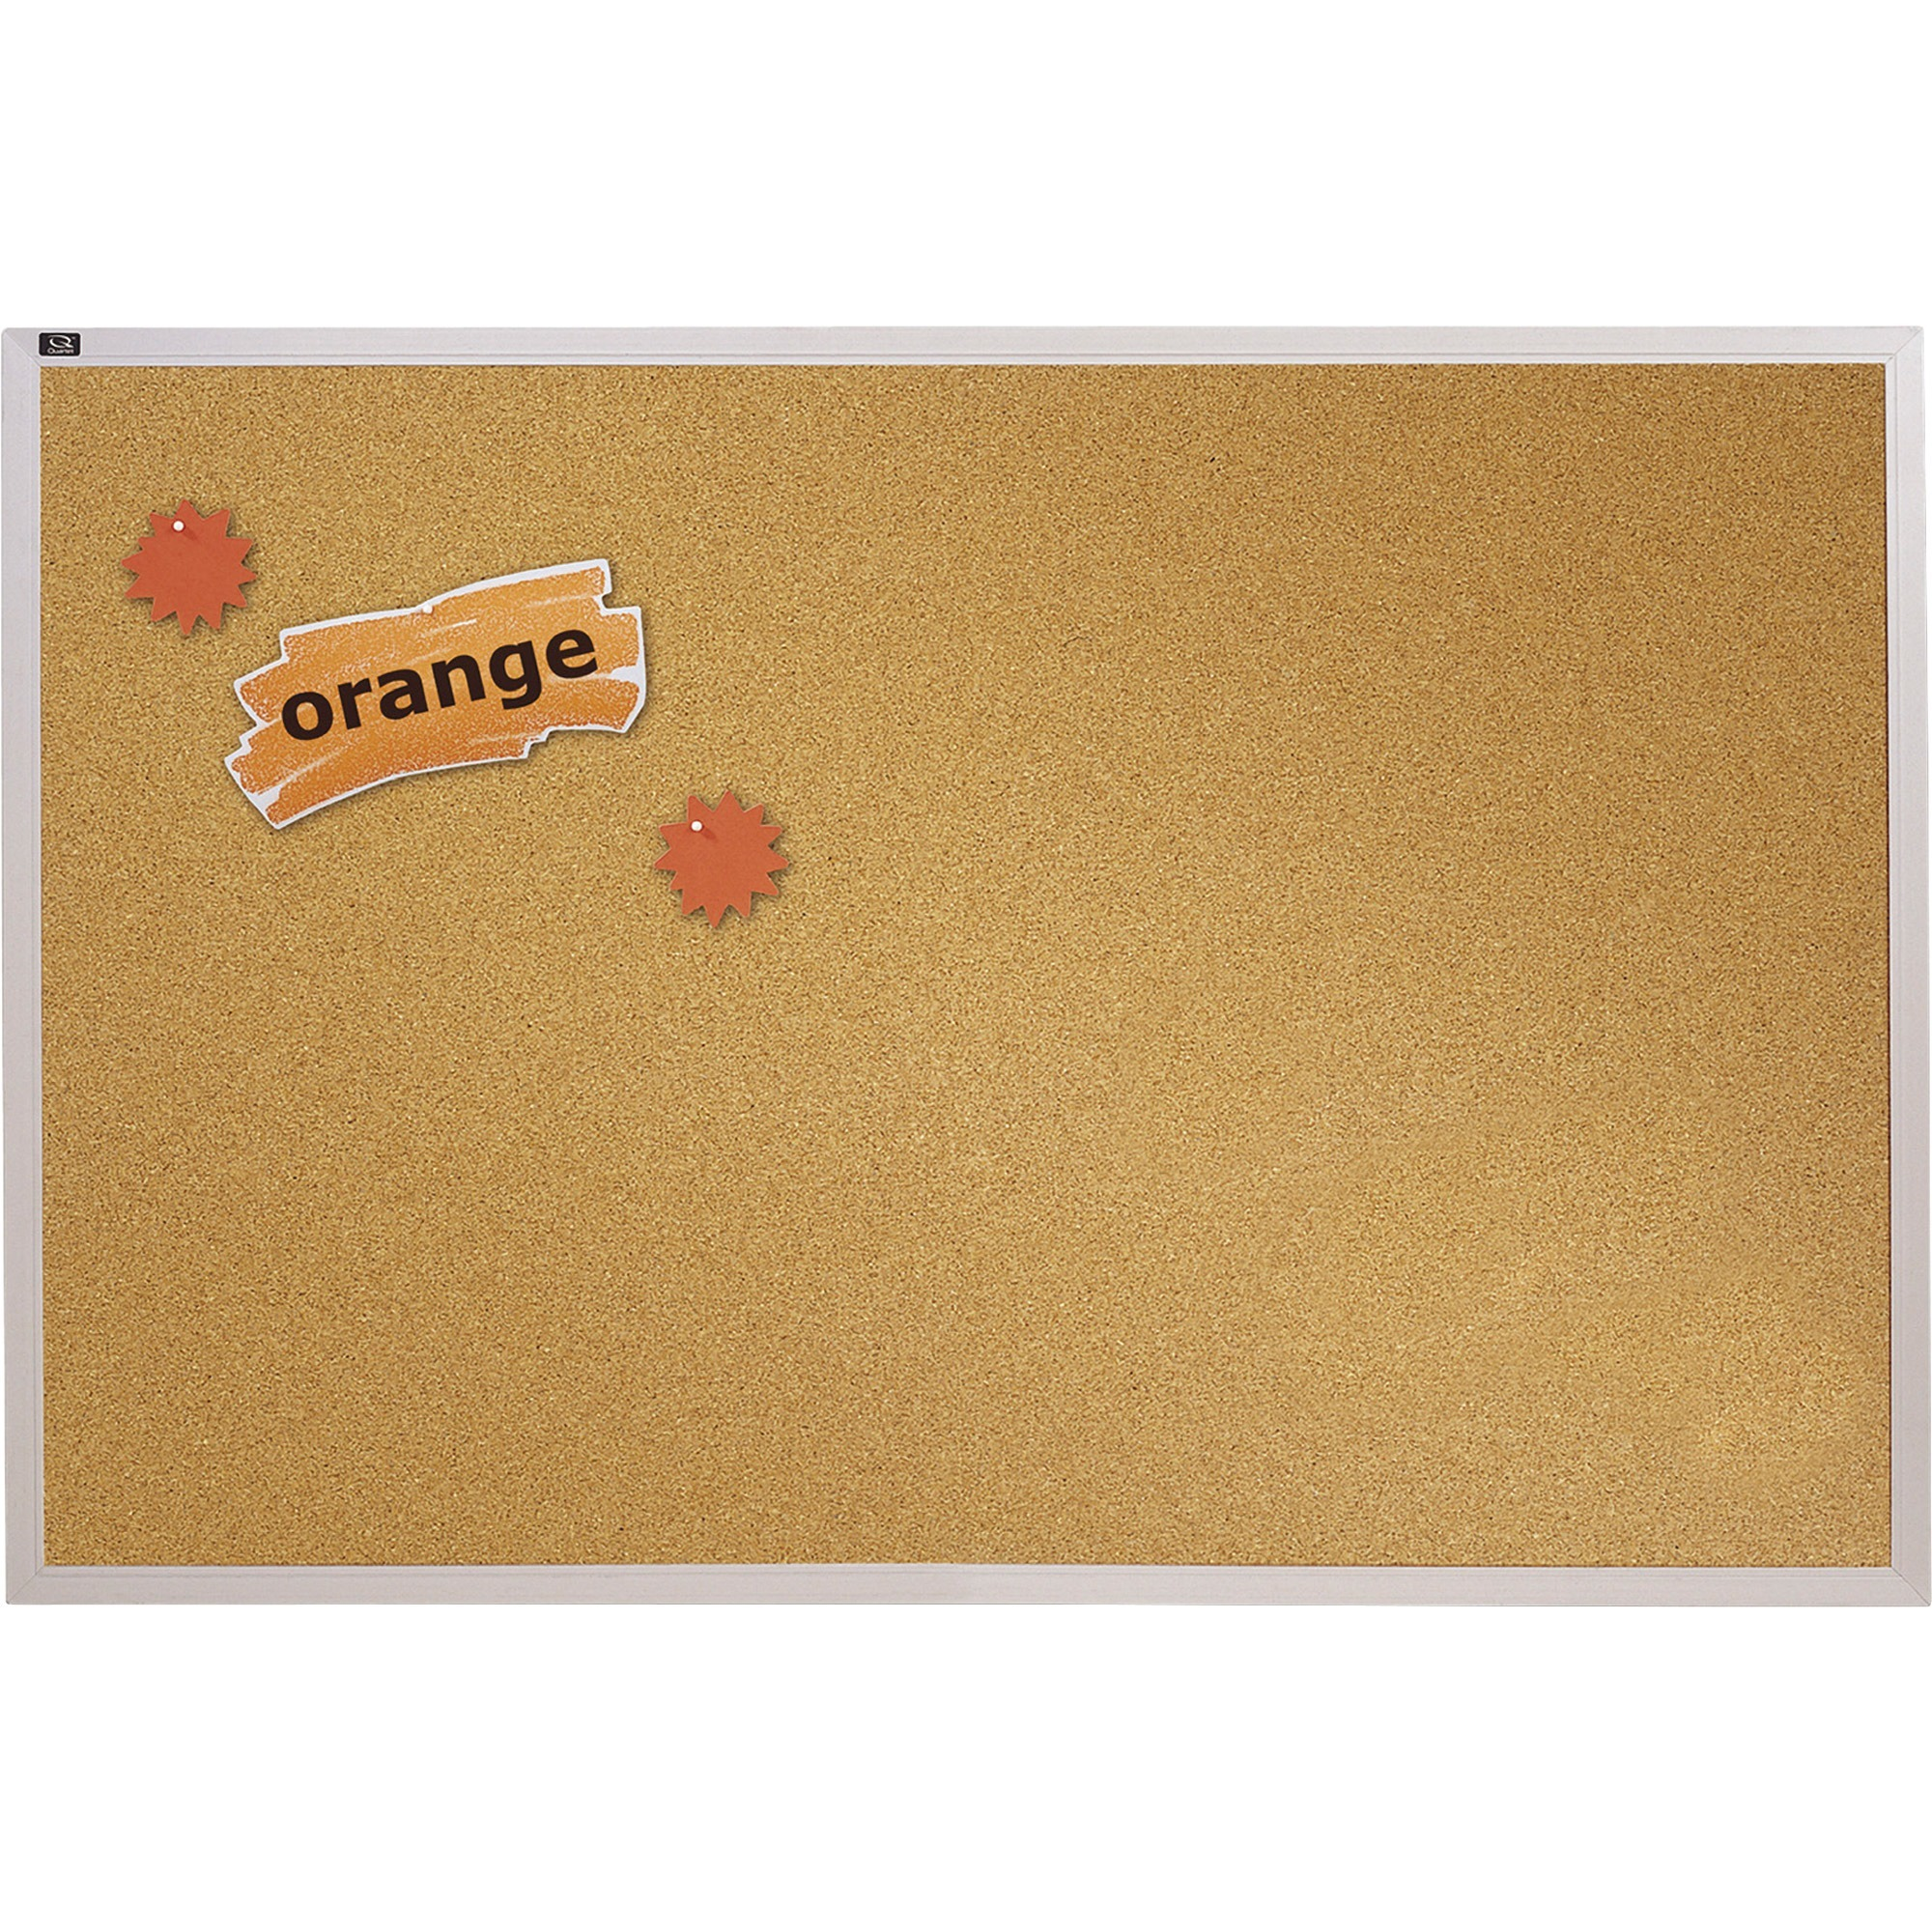 Acco Brands Corporation Quartet® Natural Cork Bulletin Board, 4 X 8, Aluminum Frame - 48 Height X 96 Width - Brown Natural Cork Surface - Silver Aluminum Frame - 1 / Each